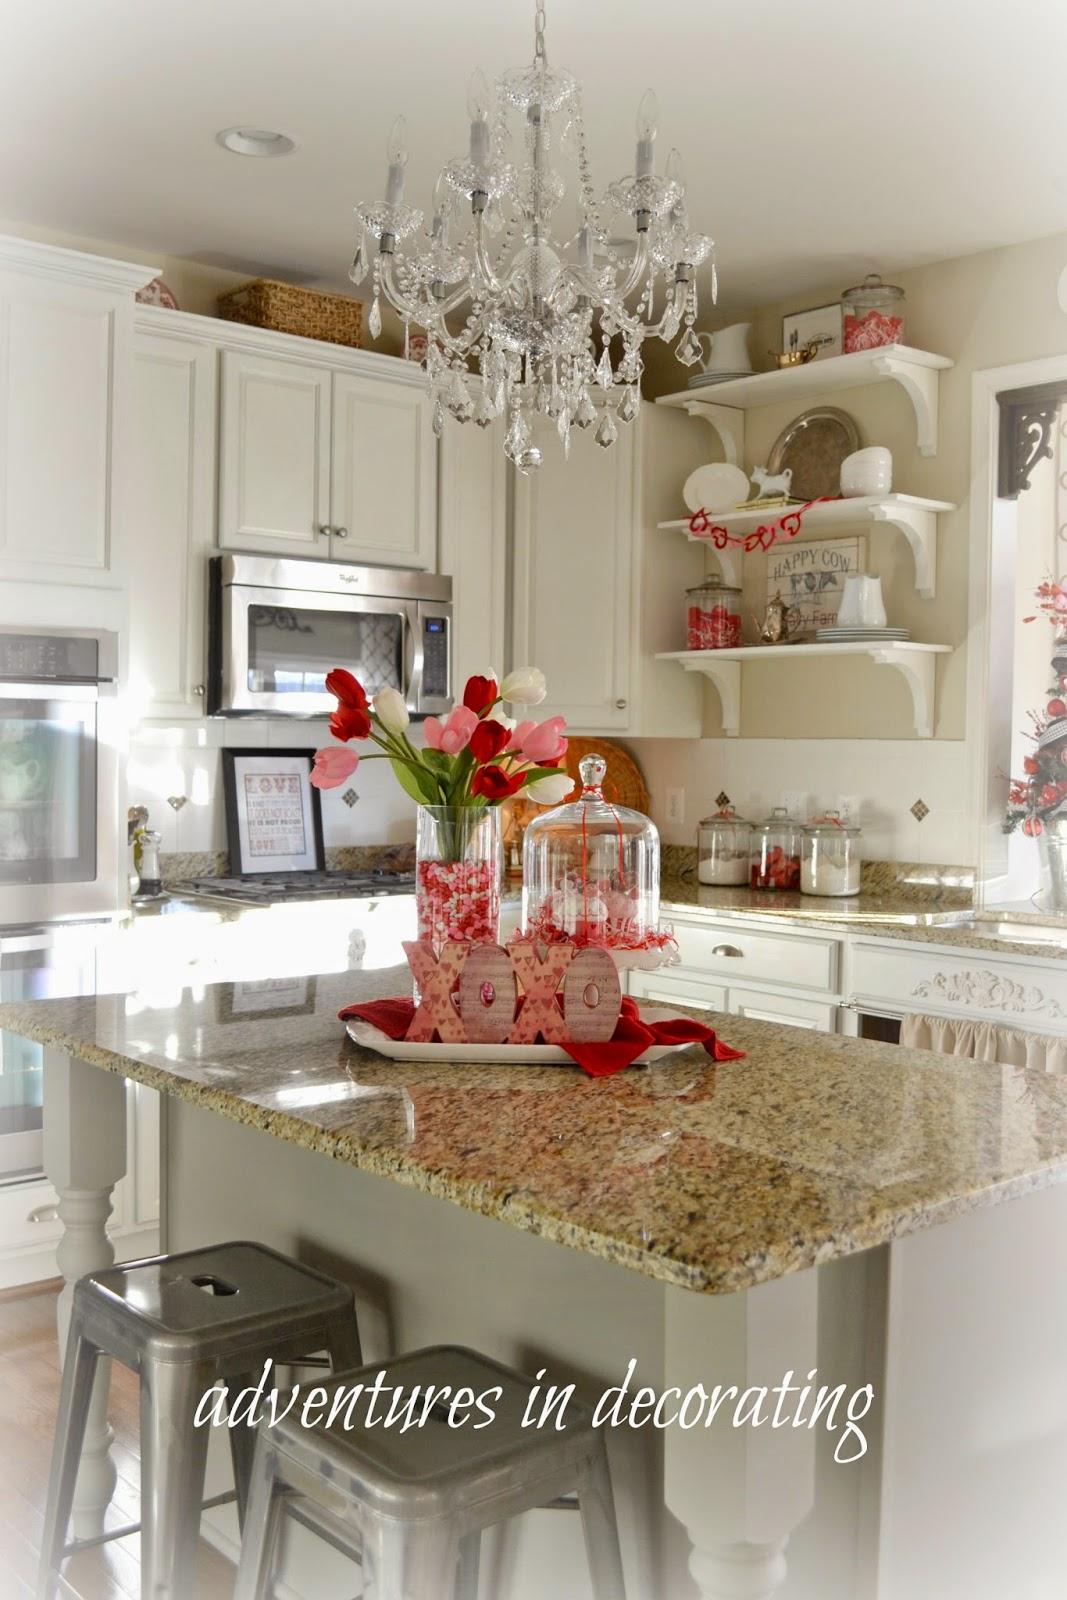 adventures in decorating a little more valentine decorating. Black Bedroom Furniture Sets. Home Design Ideas